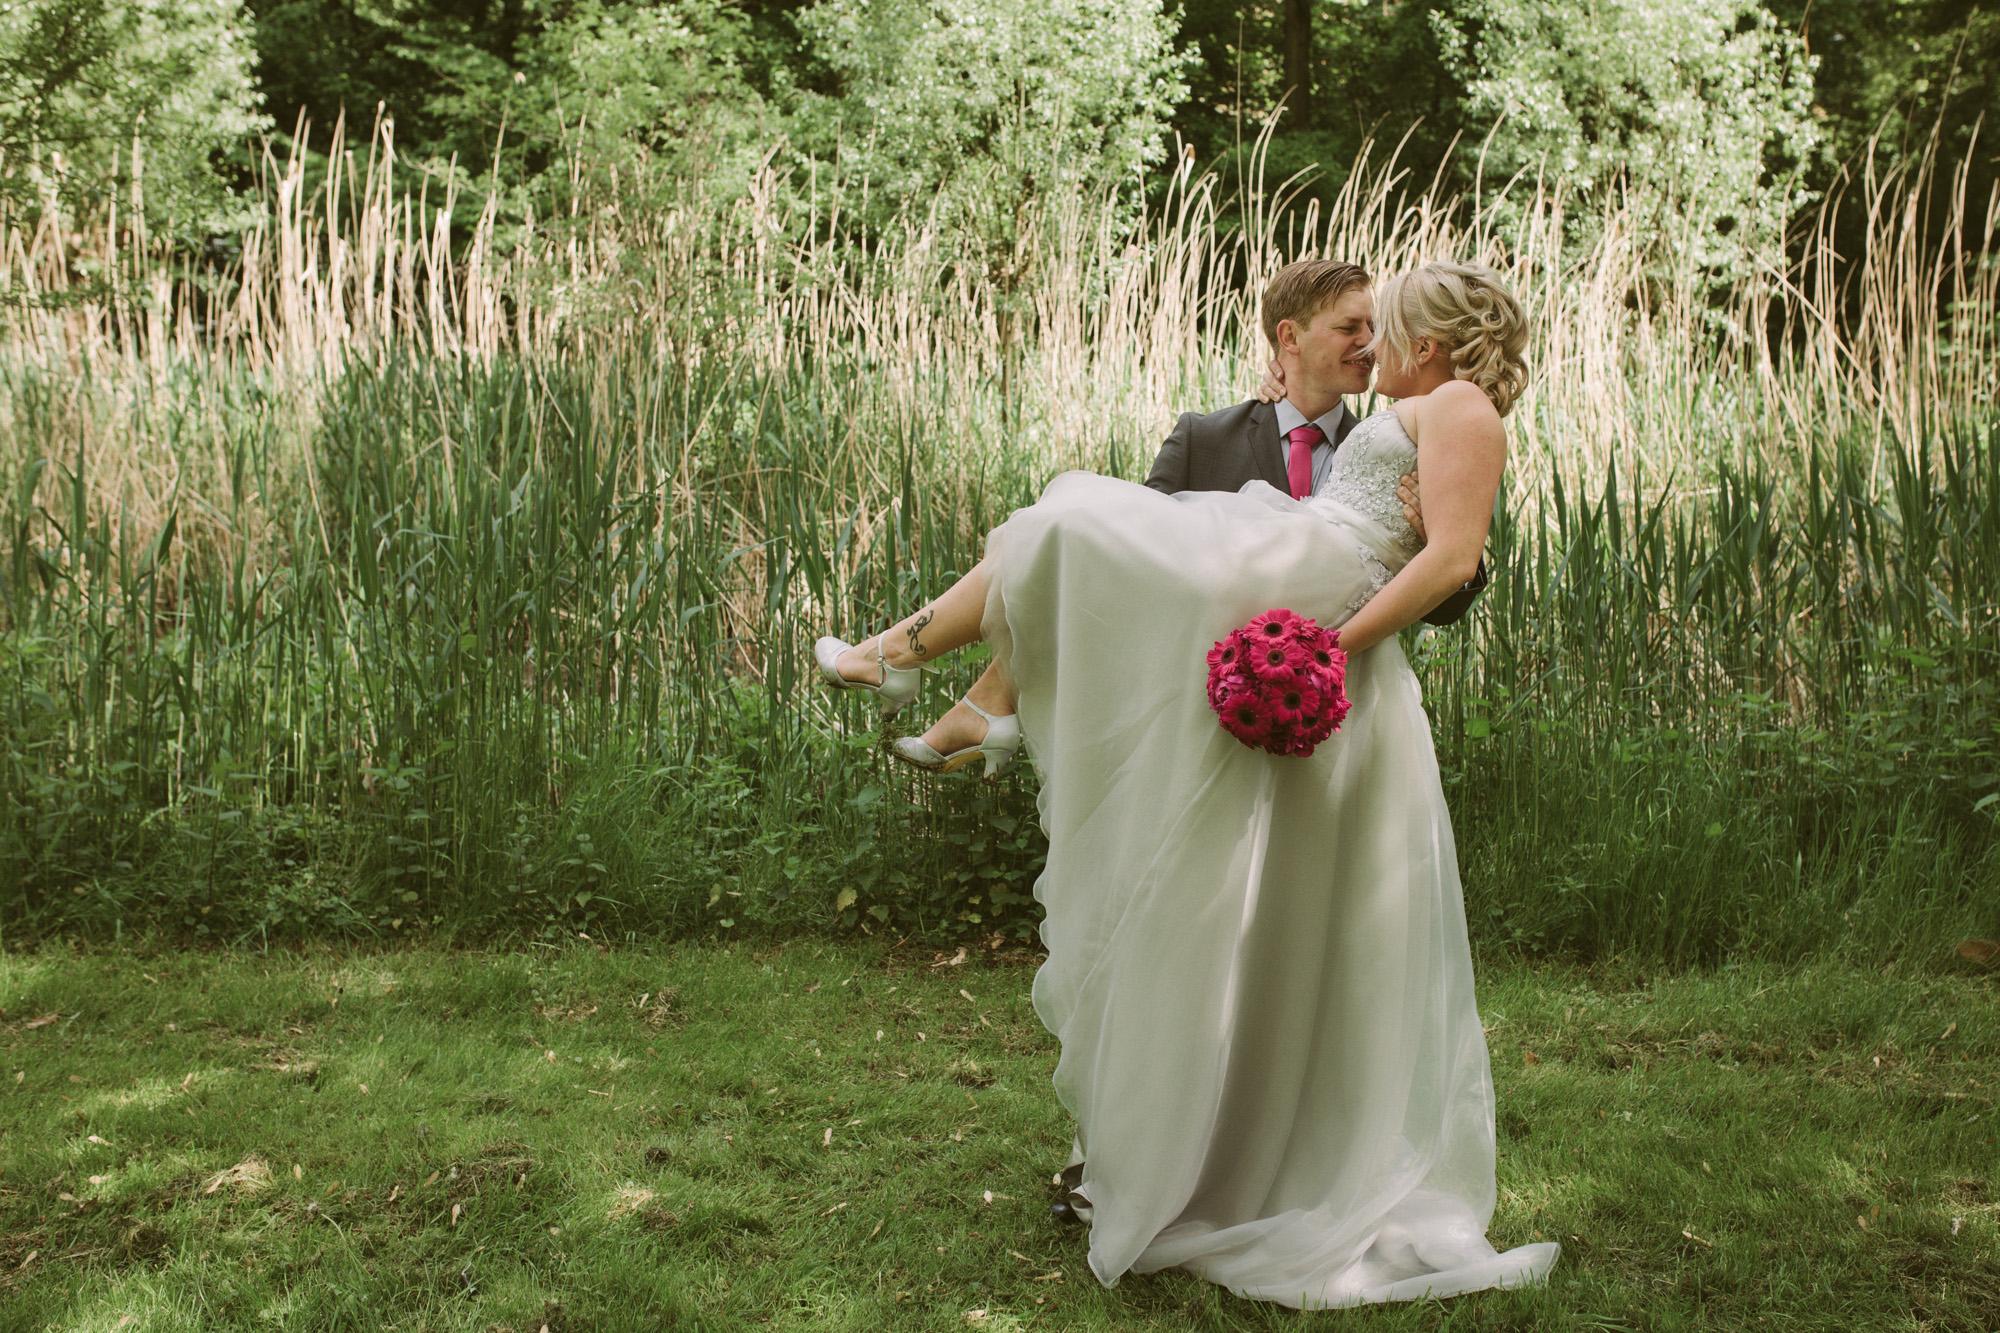 Claudia-Krawinkel-Hochzeitsfotografie-Essen-Duisburg-Standesamt-Schloss-Borbeck-37